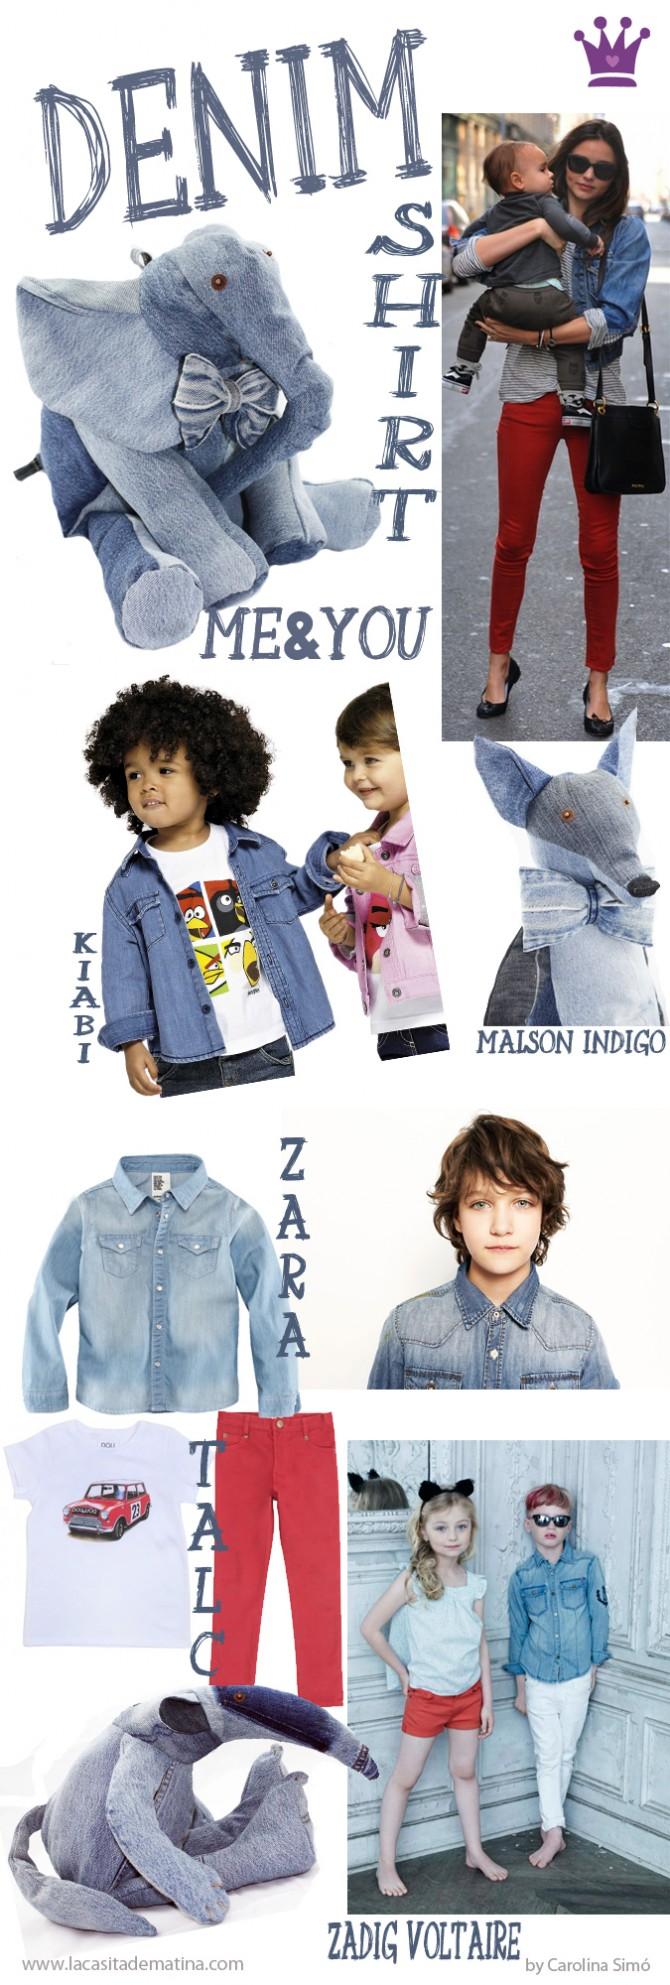 Tendencias Moda Infantil, Denim Shirt, Miranda Kerr, La casita de Martina, Blog de Moda Infantil, Carolina Simó